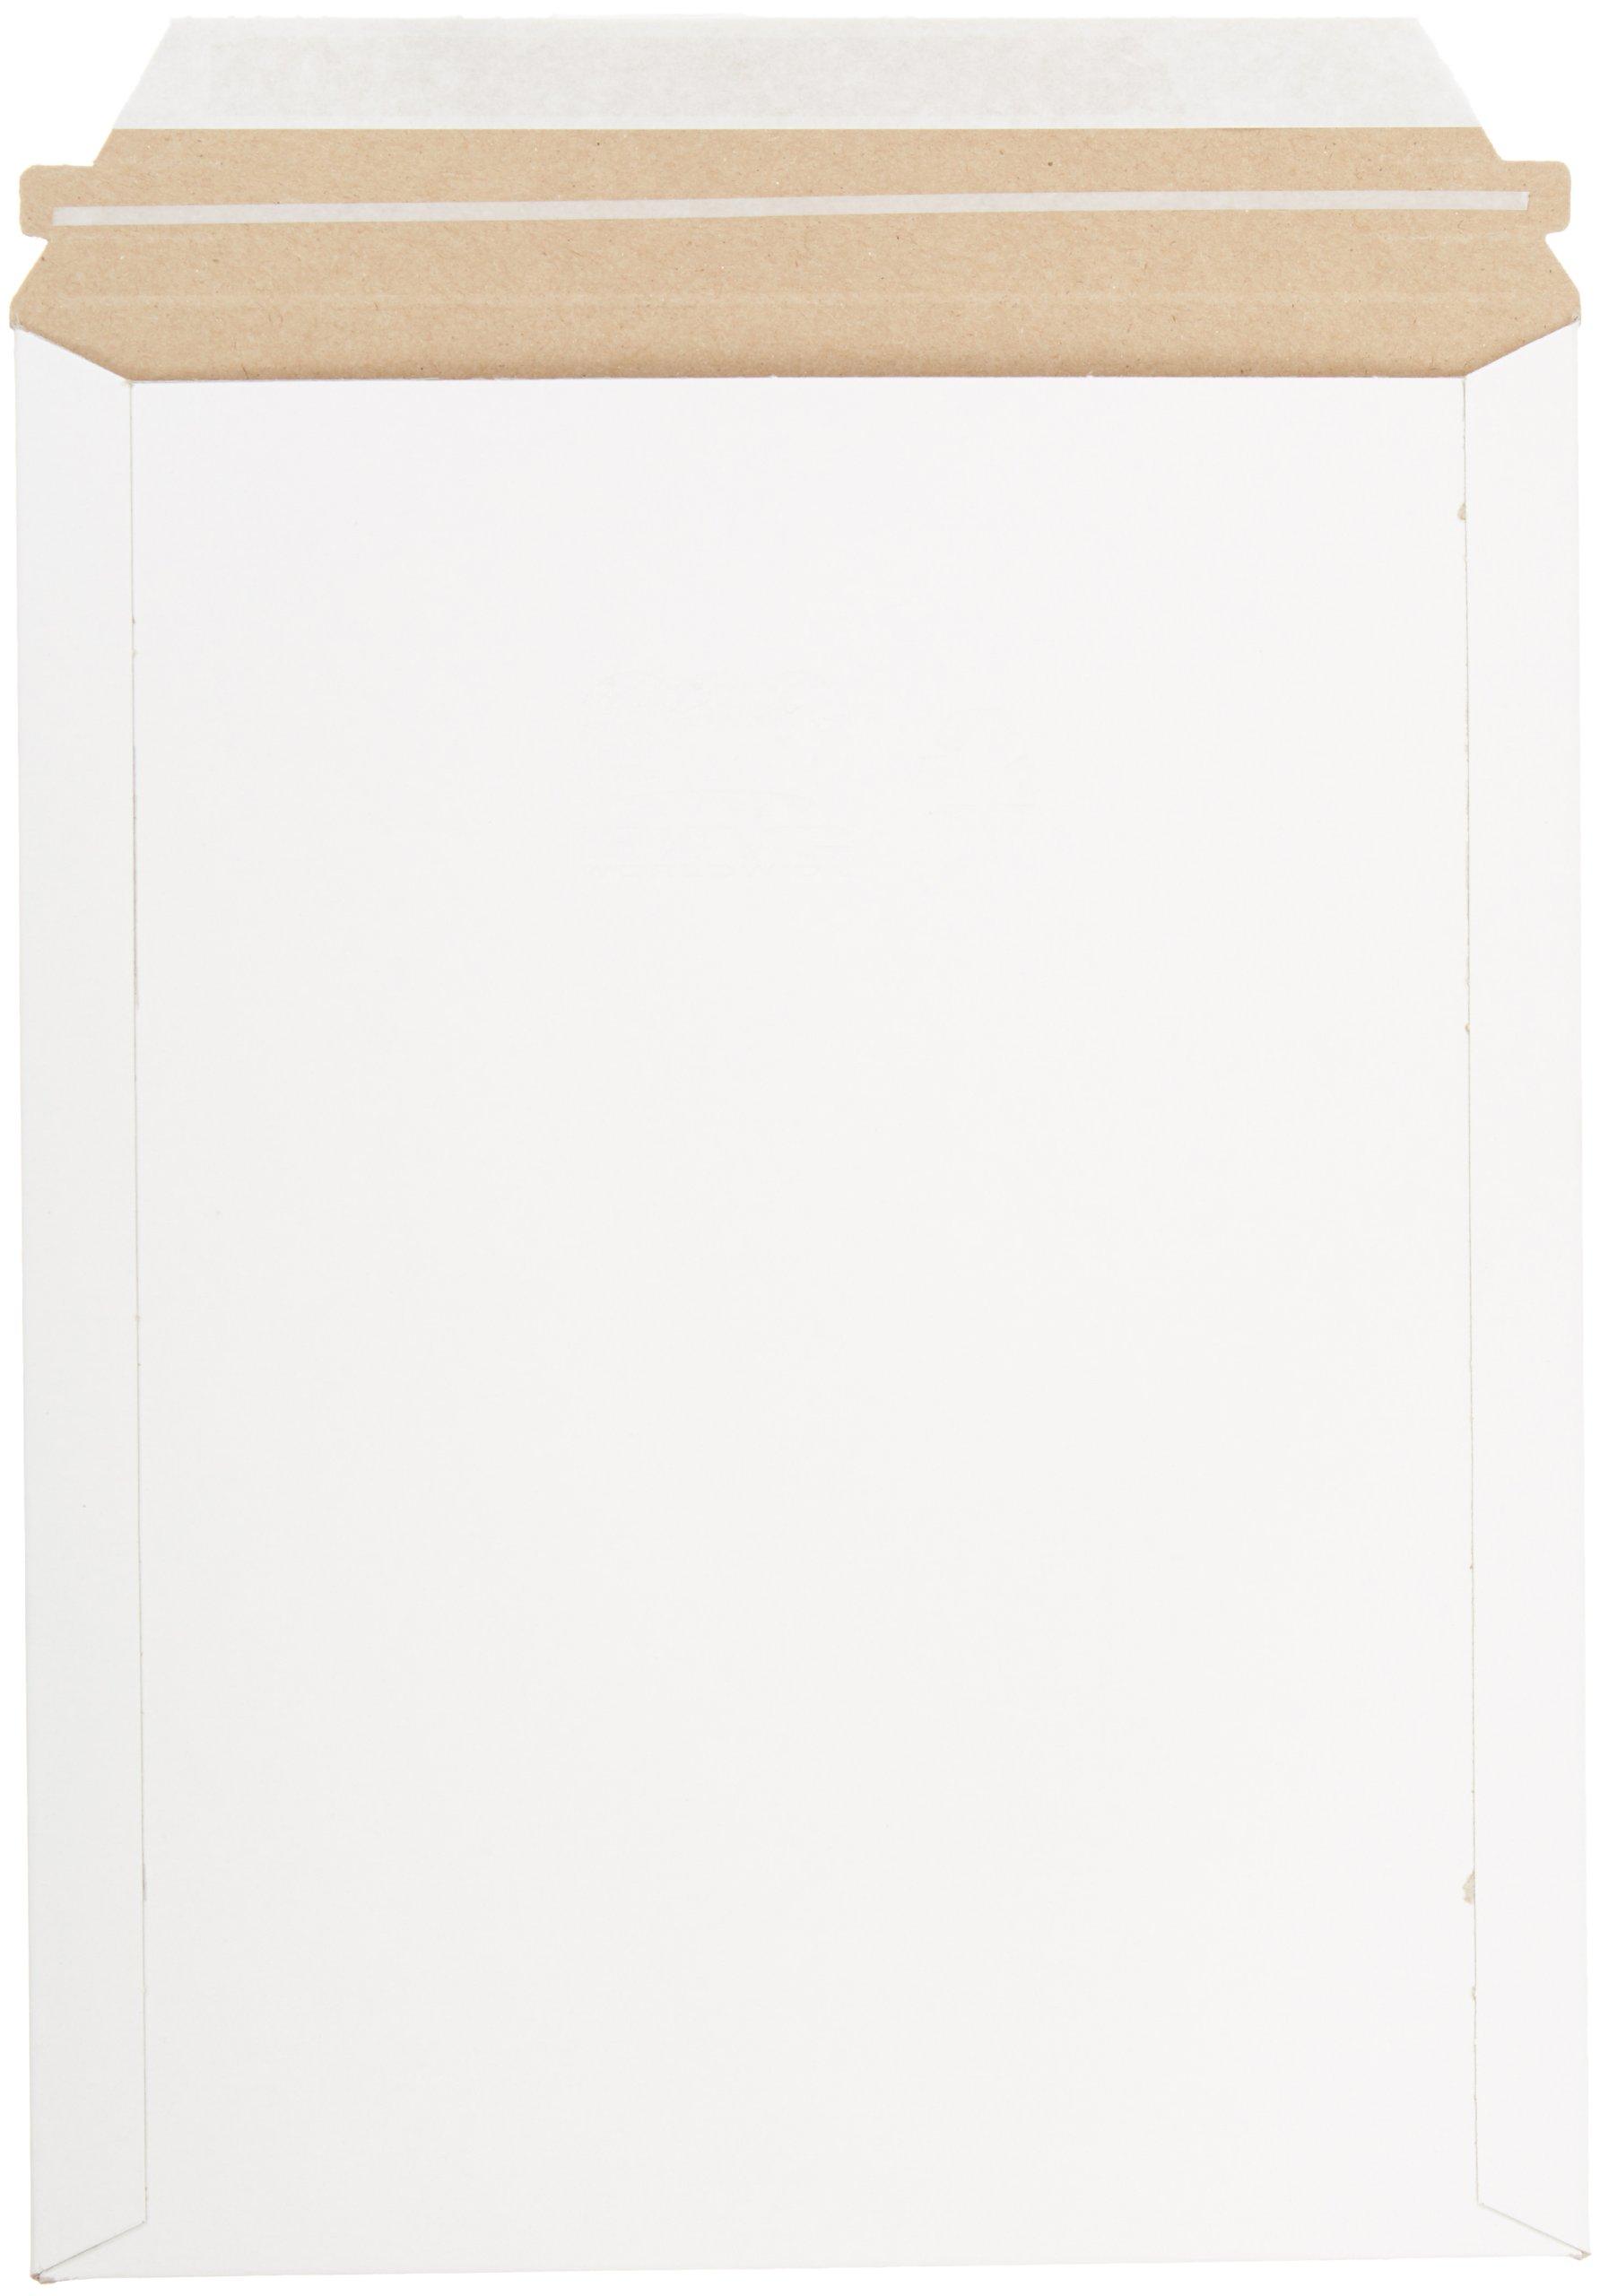 Pratt MJ-4 Self-Seal Stay Flat Mailer, White, 9.75'' x 12 1/4'' (Pack of 100)